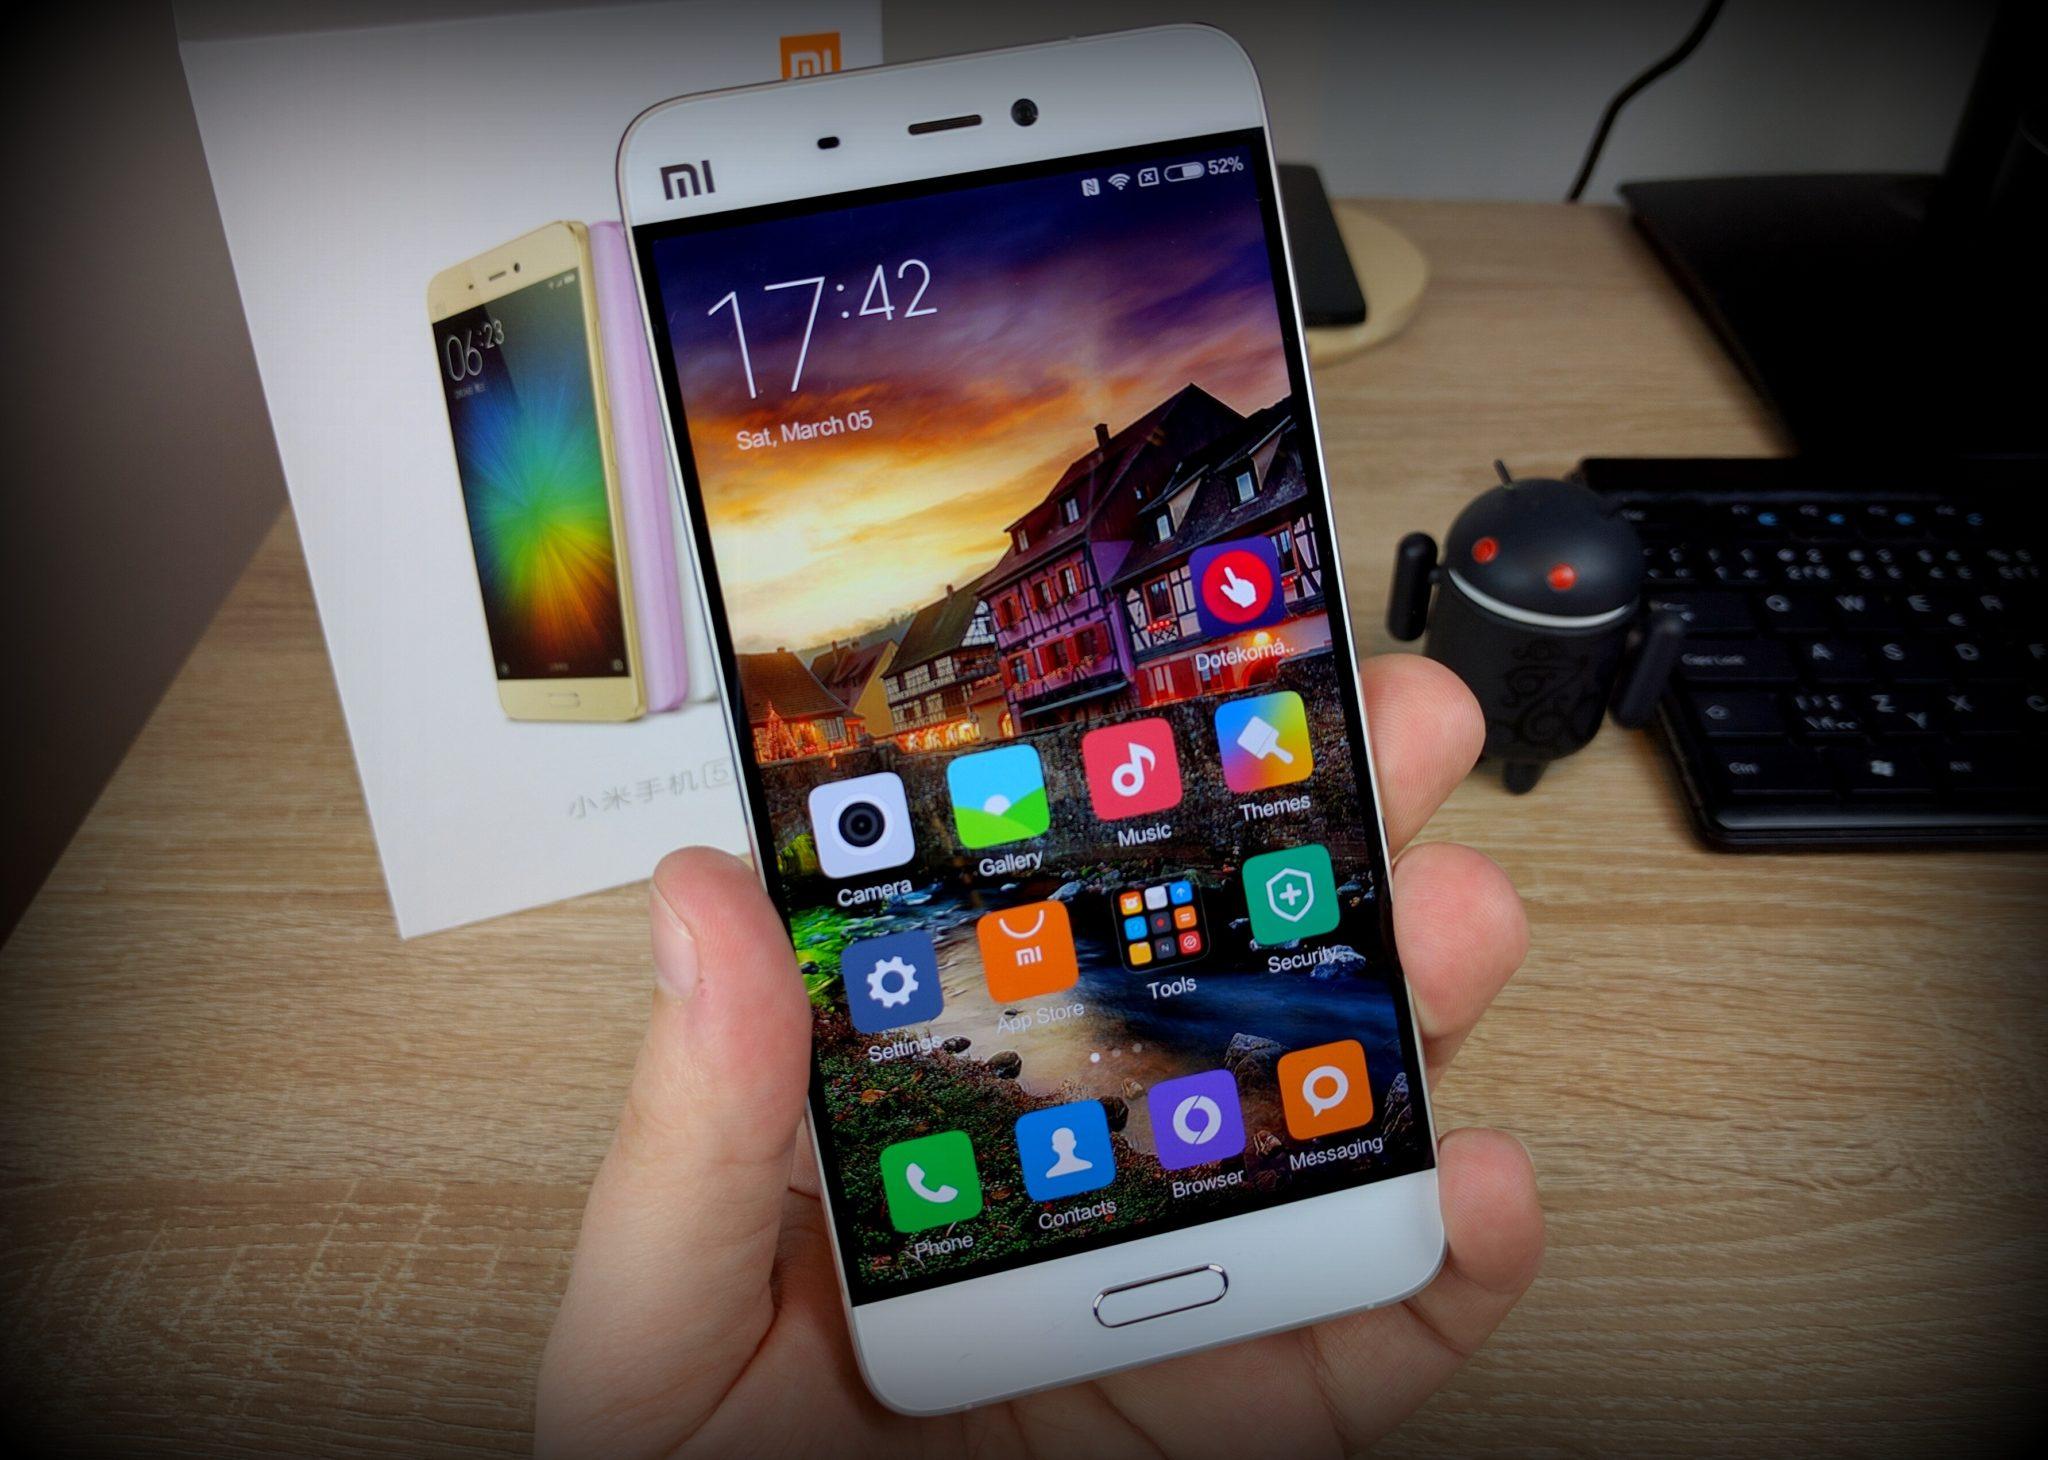 Ochutnávky #23 – Xiaomi Mi5